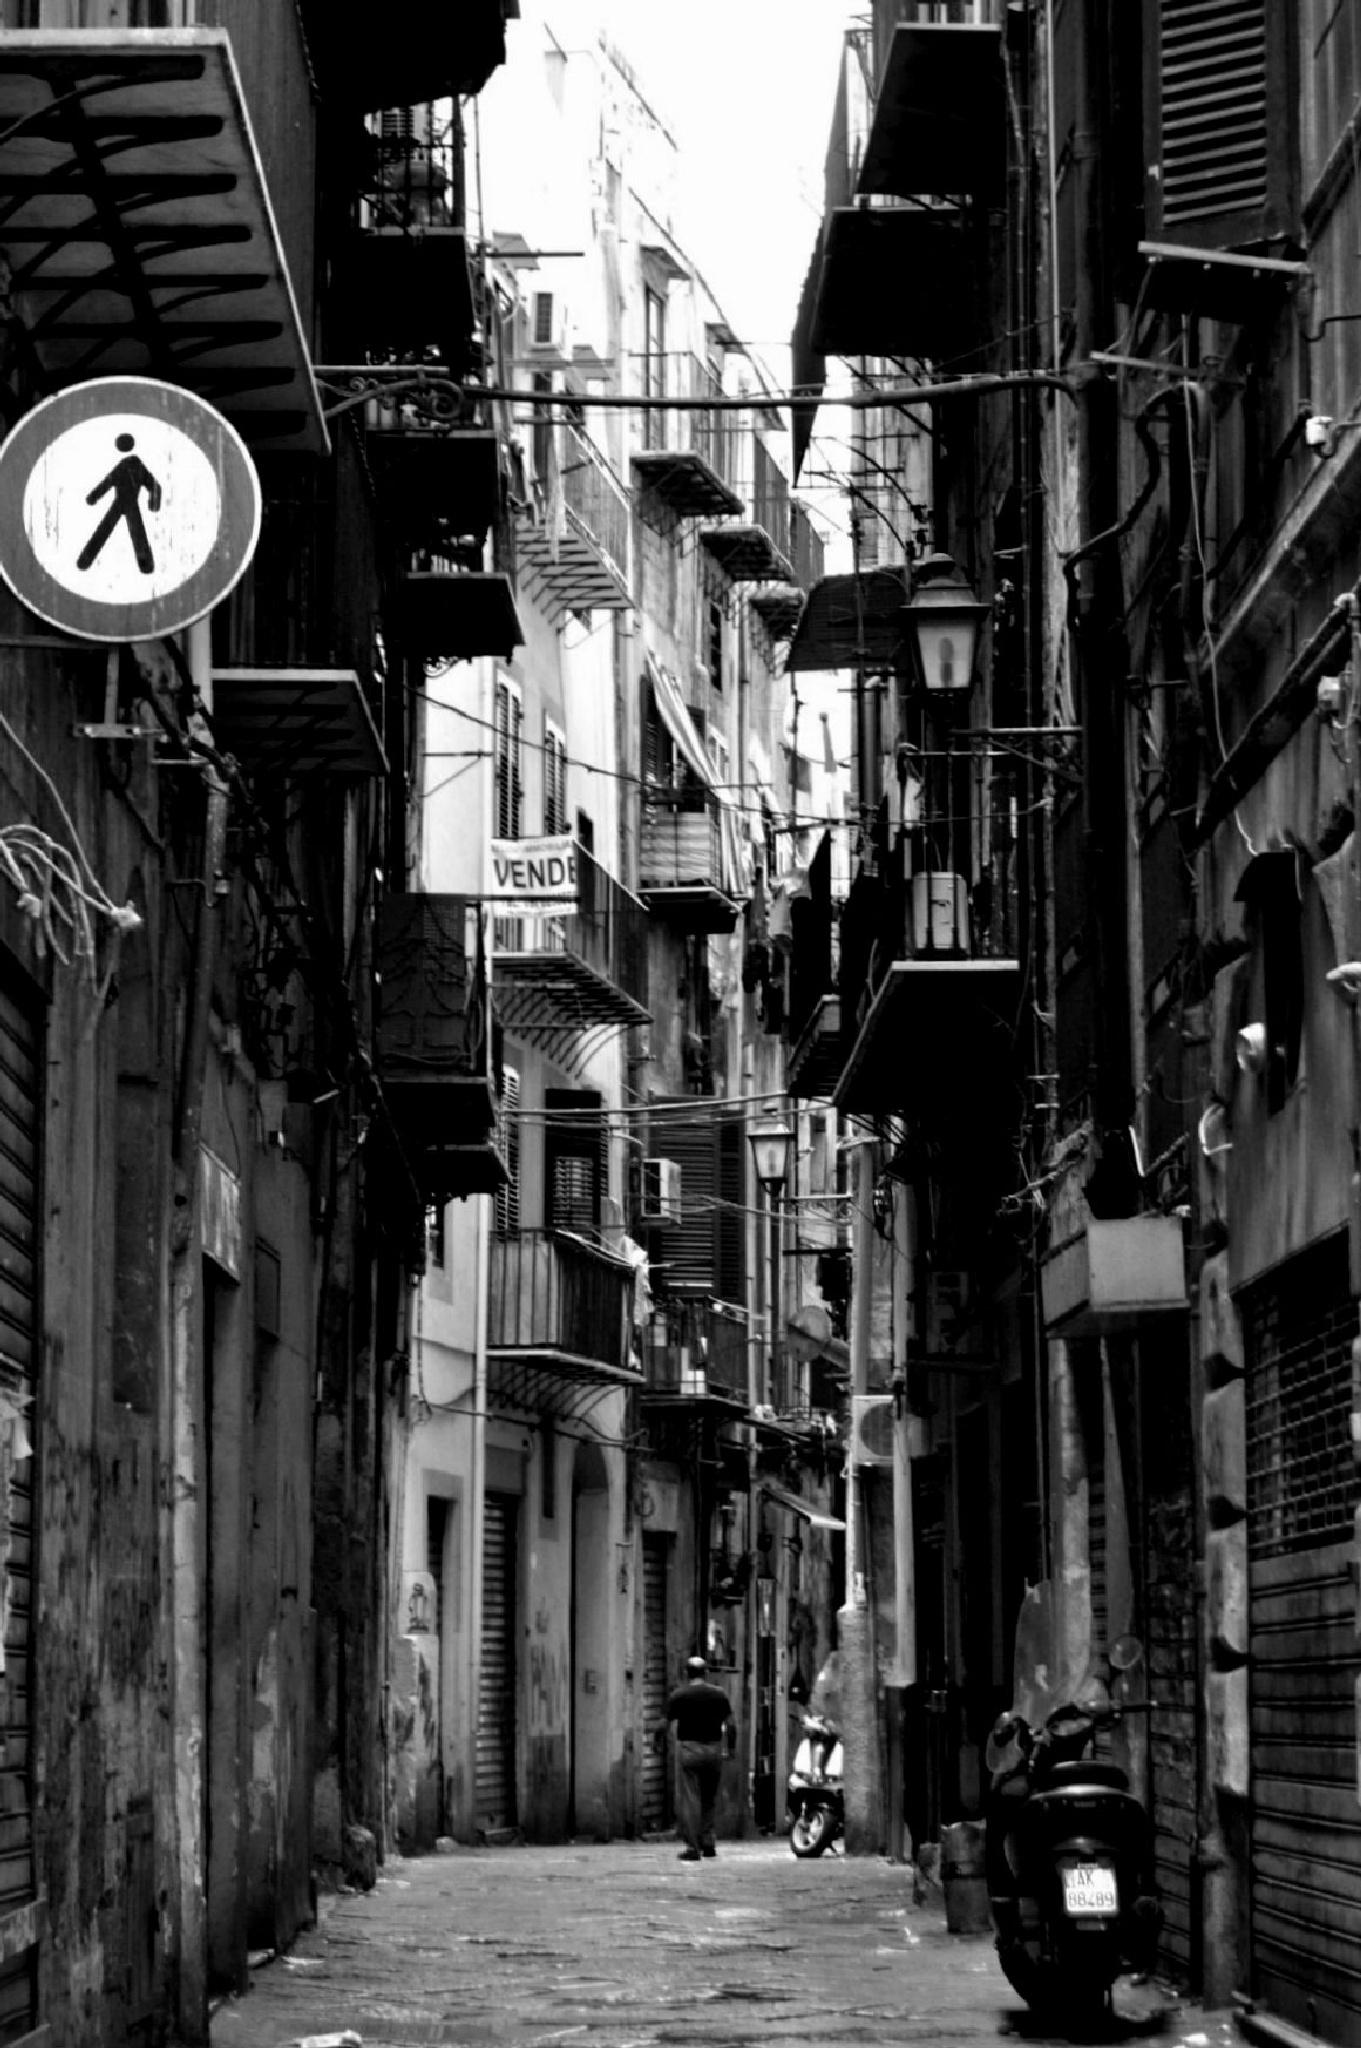 Only walk by carmenlargo13